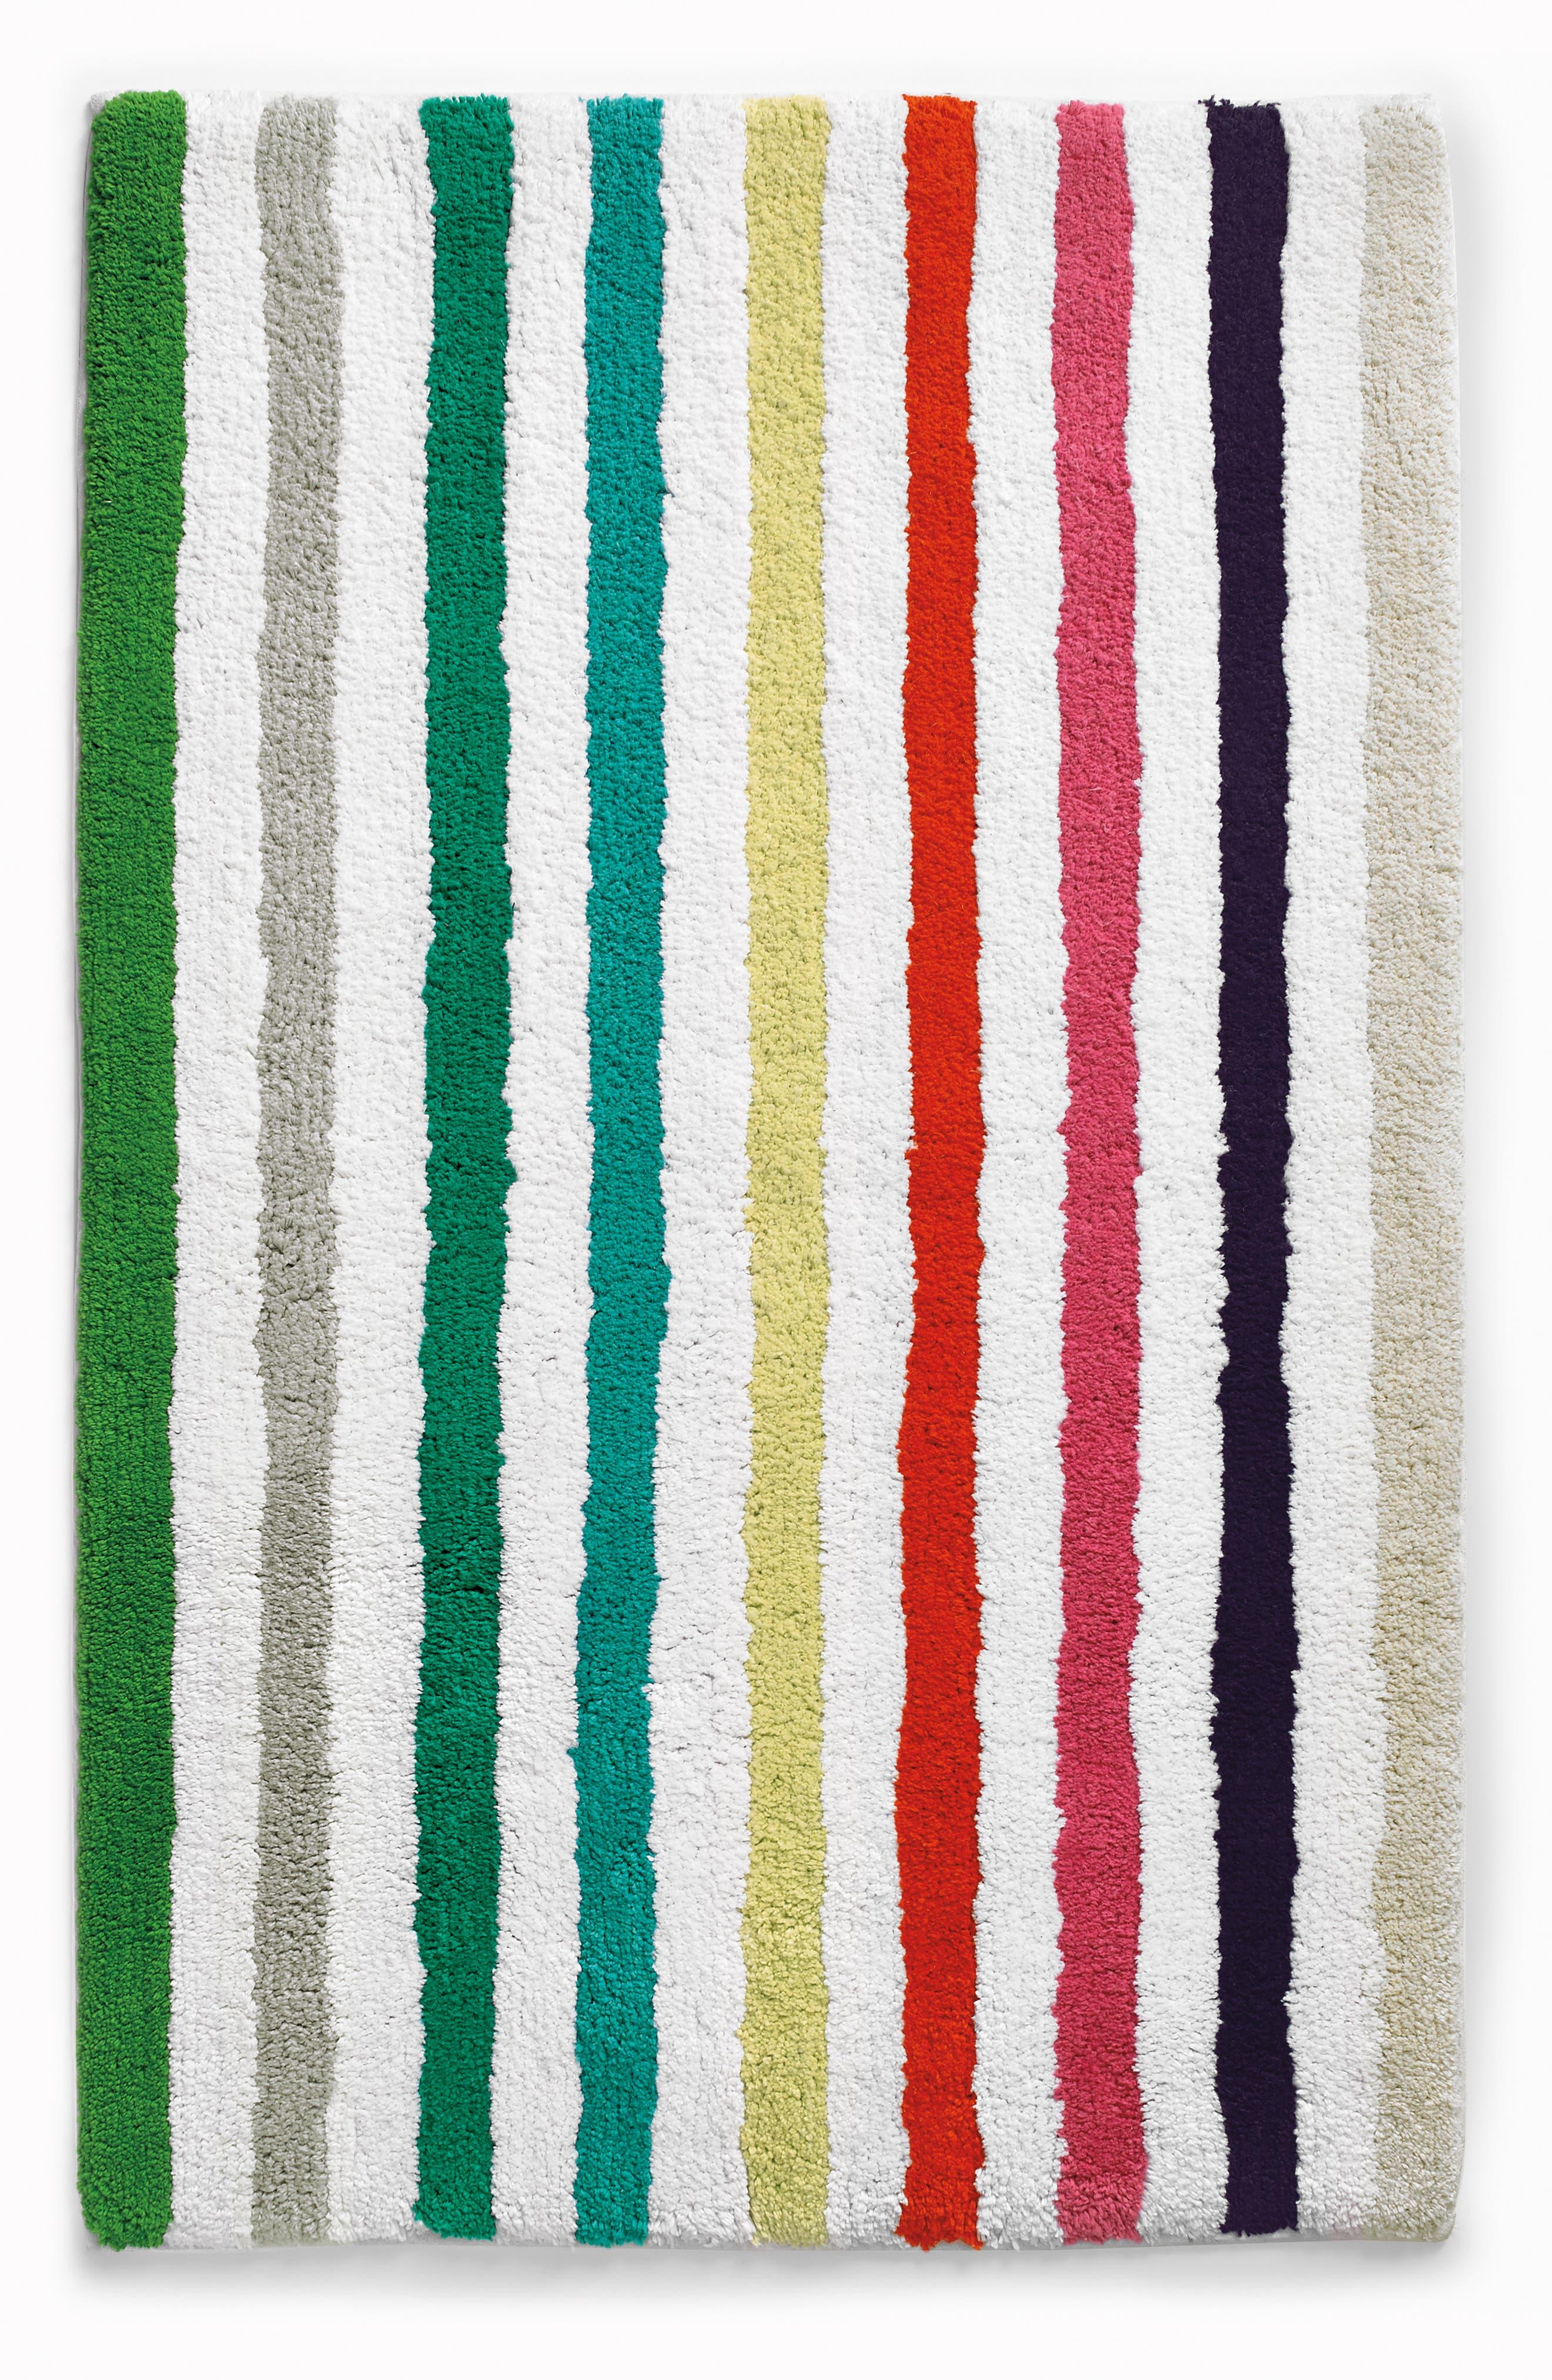 Kate Spade New York Candy Stripe Bath Rug